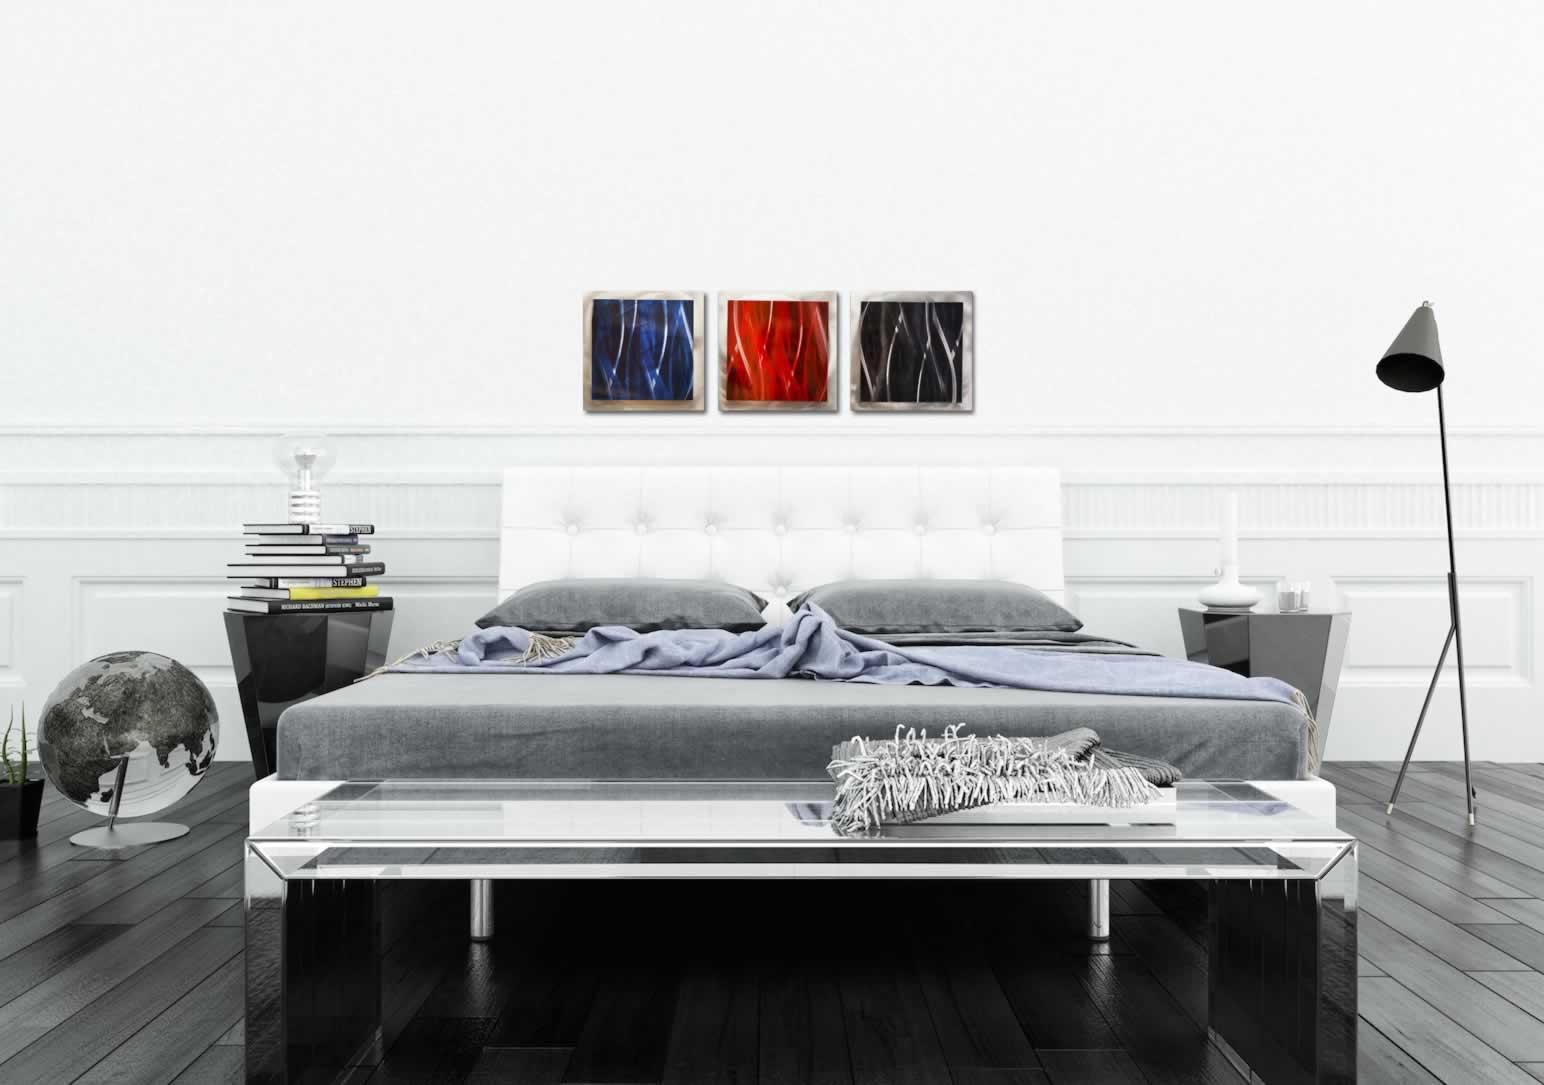 Dark Essence - Layered Modern Metal Wall Art - Lifestyle Image